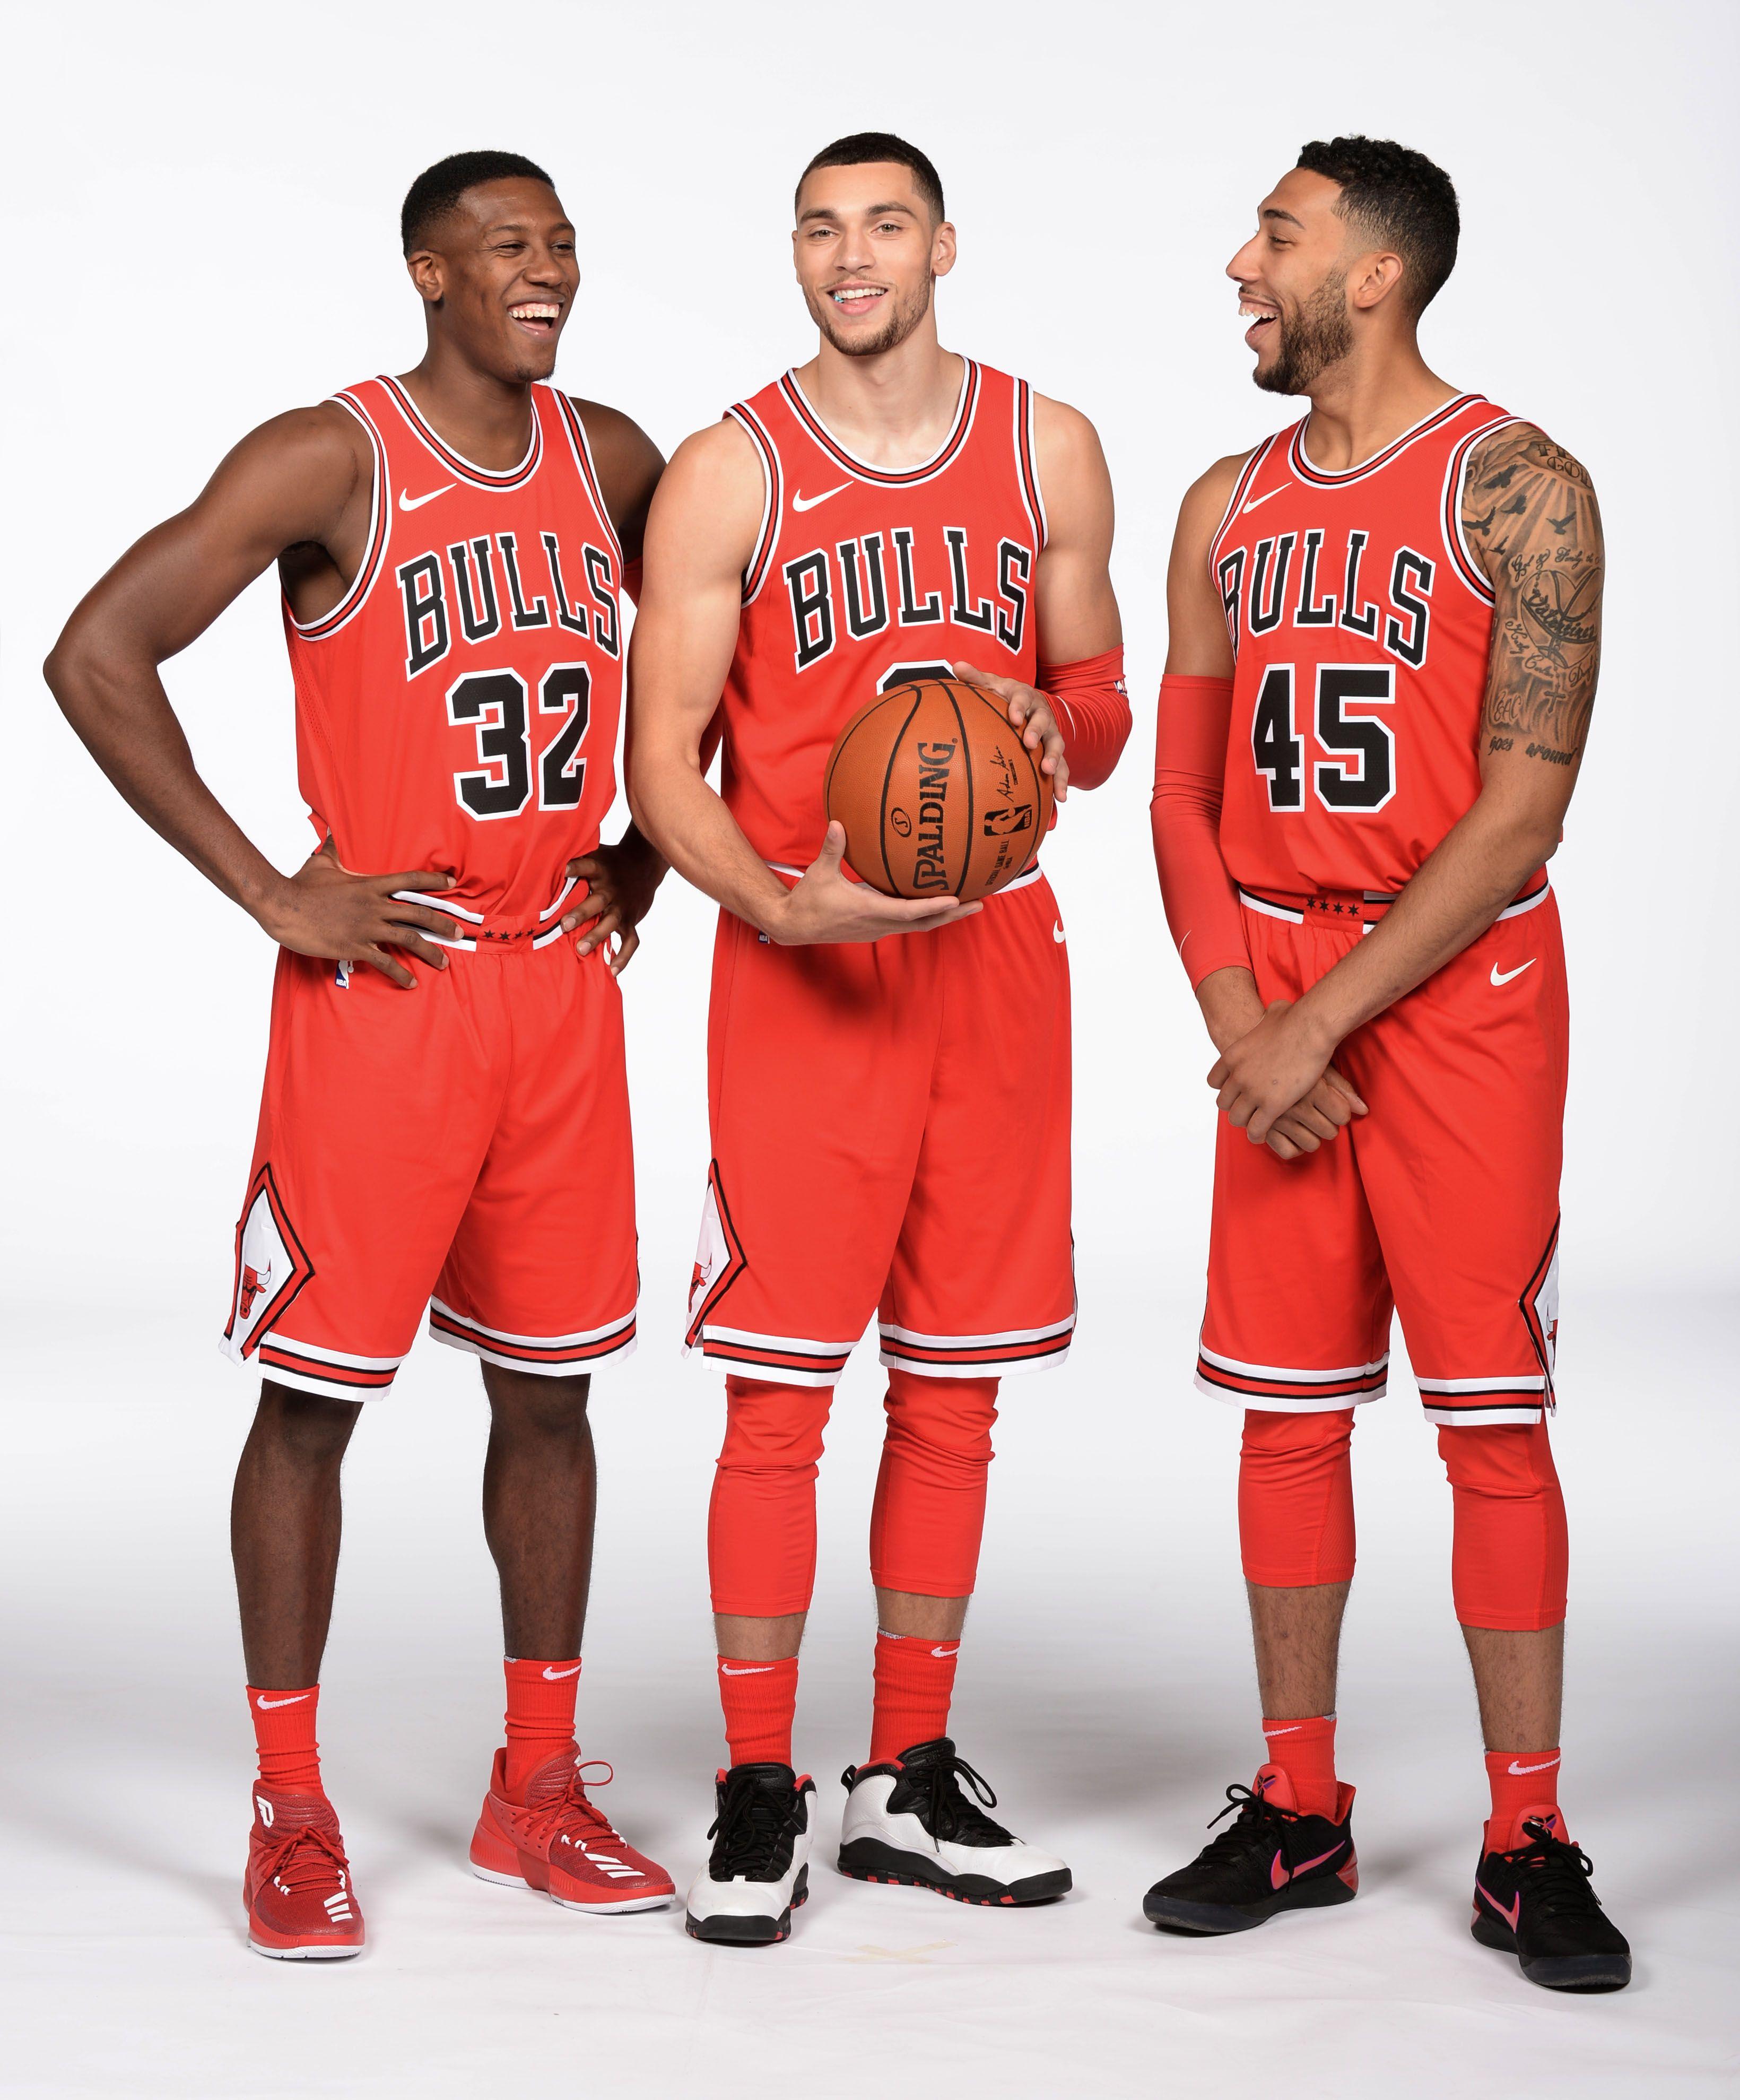 sports shoes c8829 64224 Kris Dunn, Zach Lavine and Denzel Valentine | Chicago Bulls ...